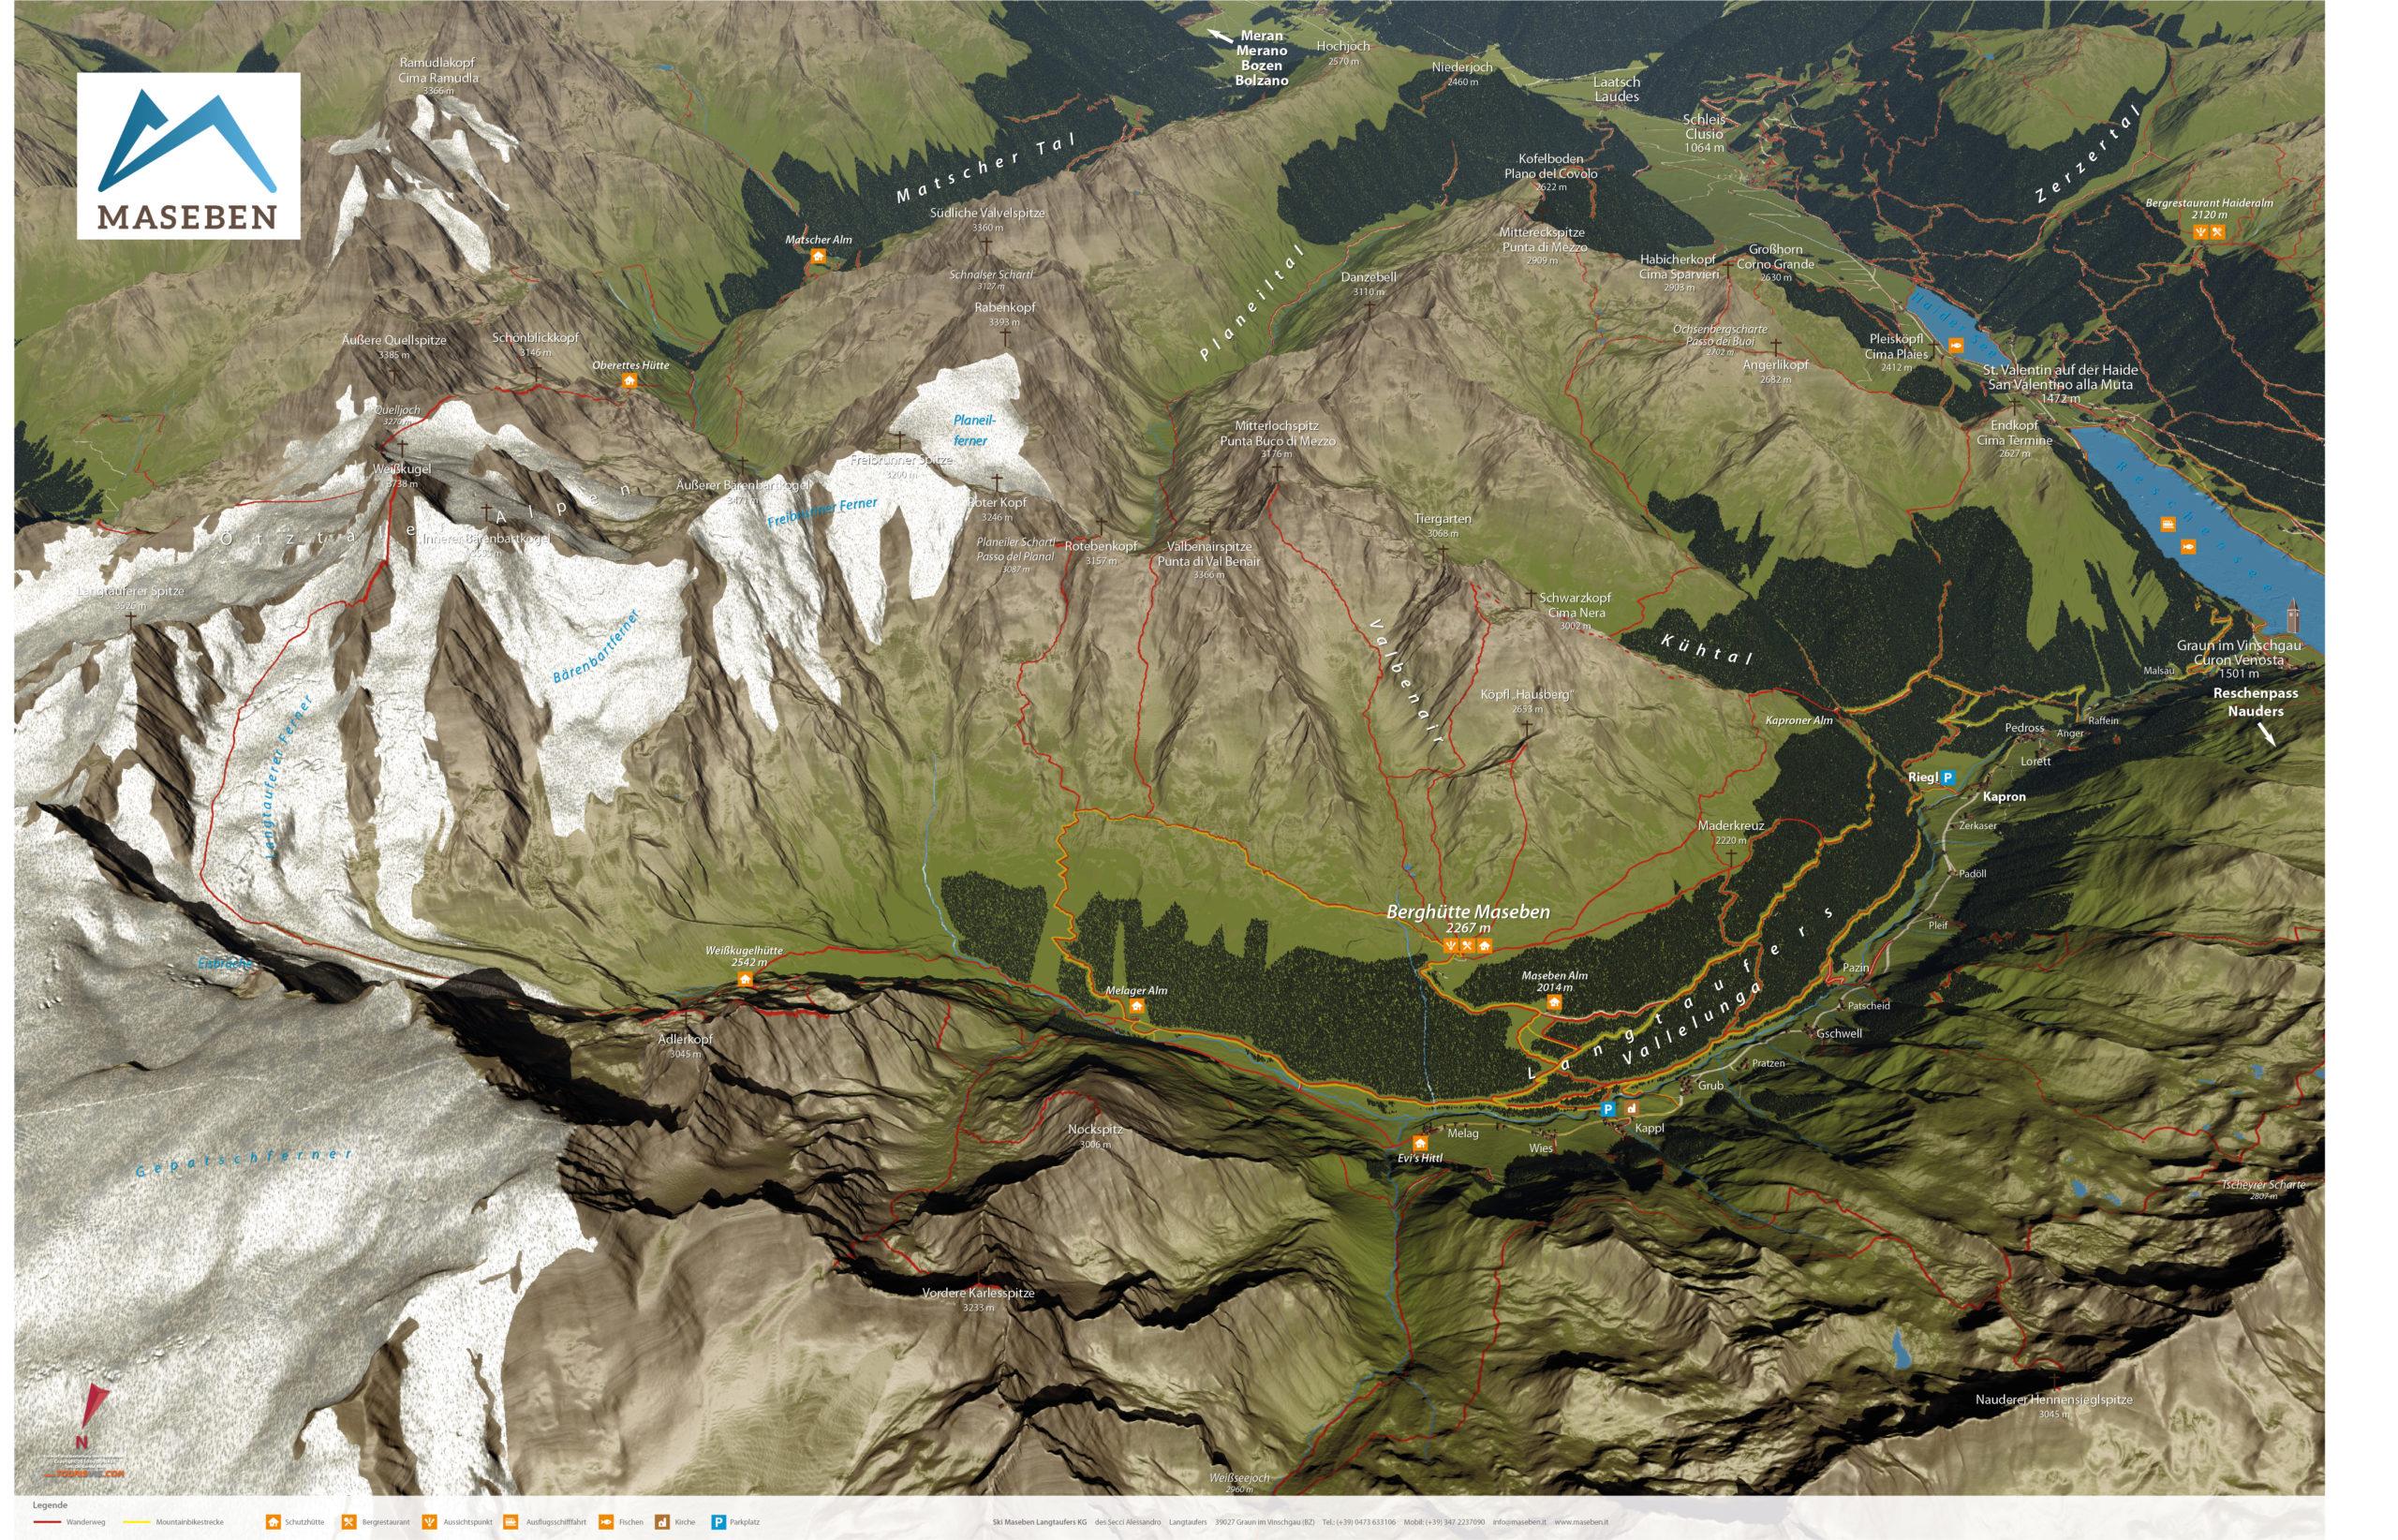 3D Panoramakarte Wandern Maseben Suedtirol